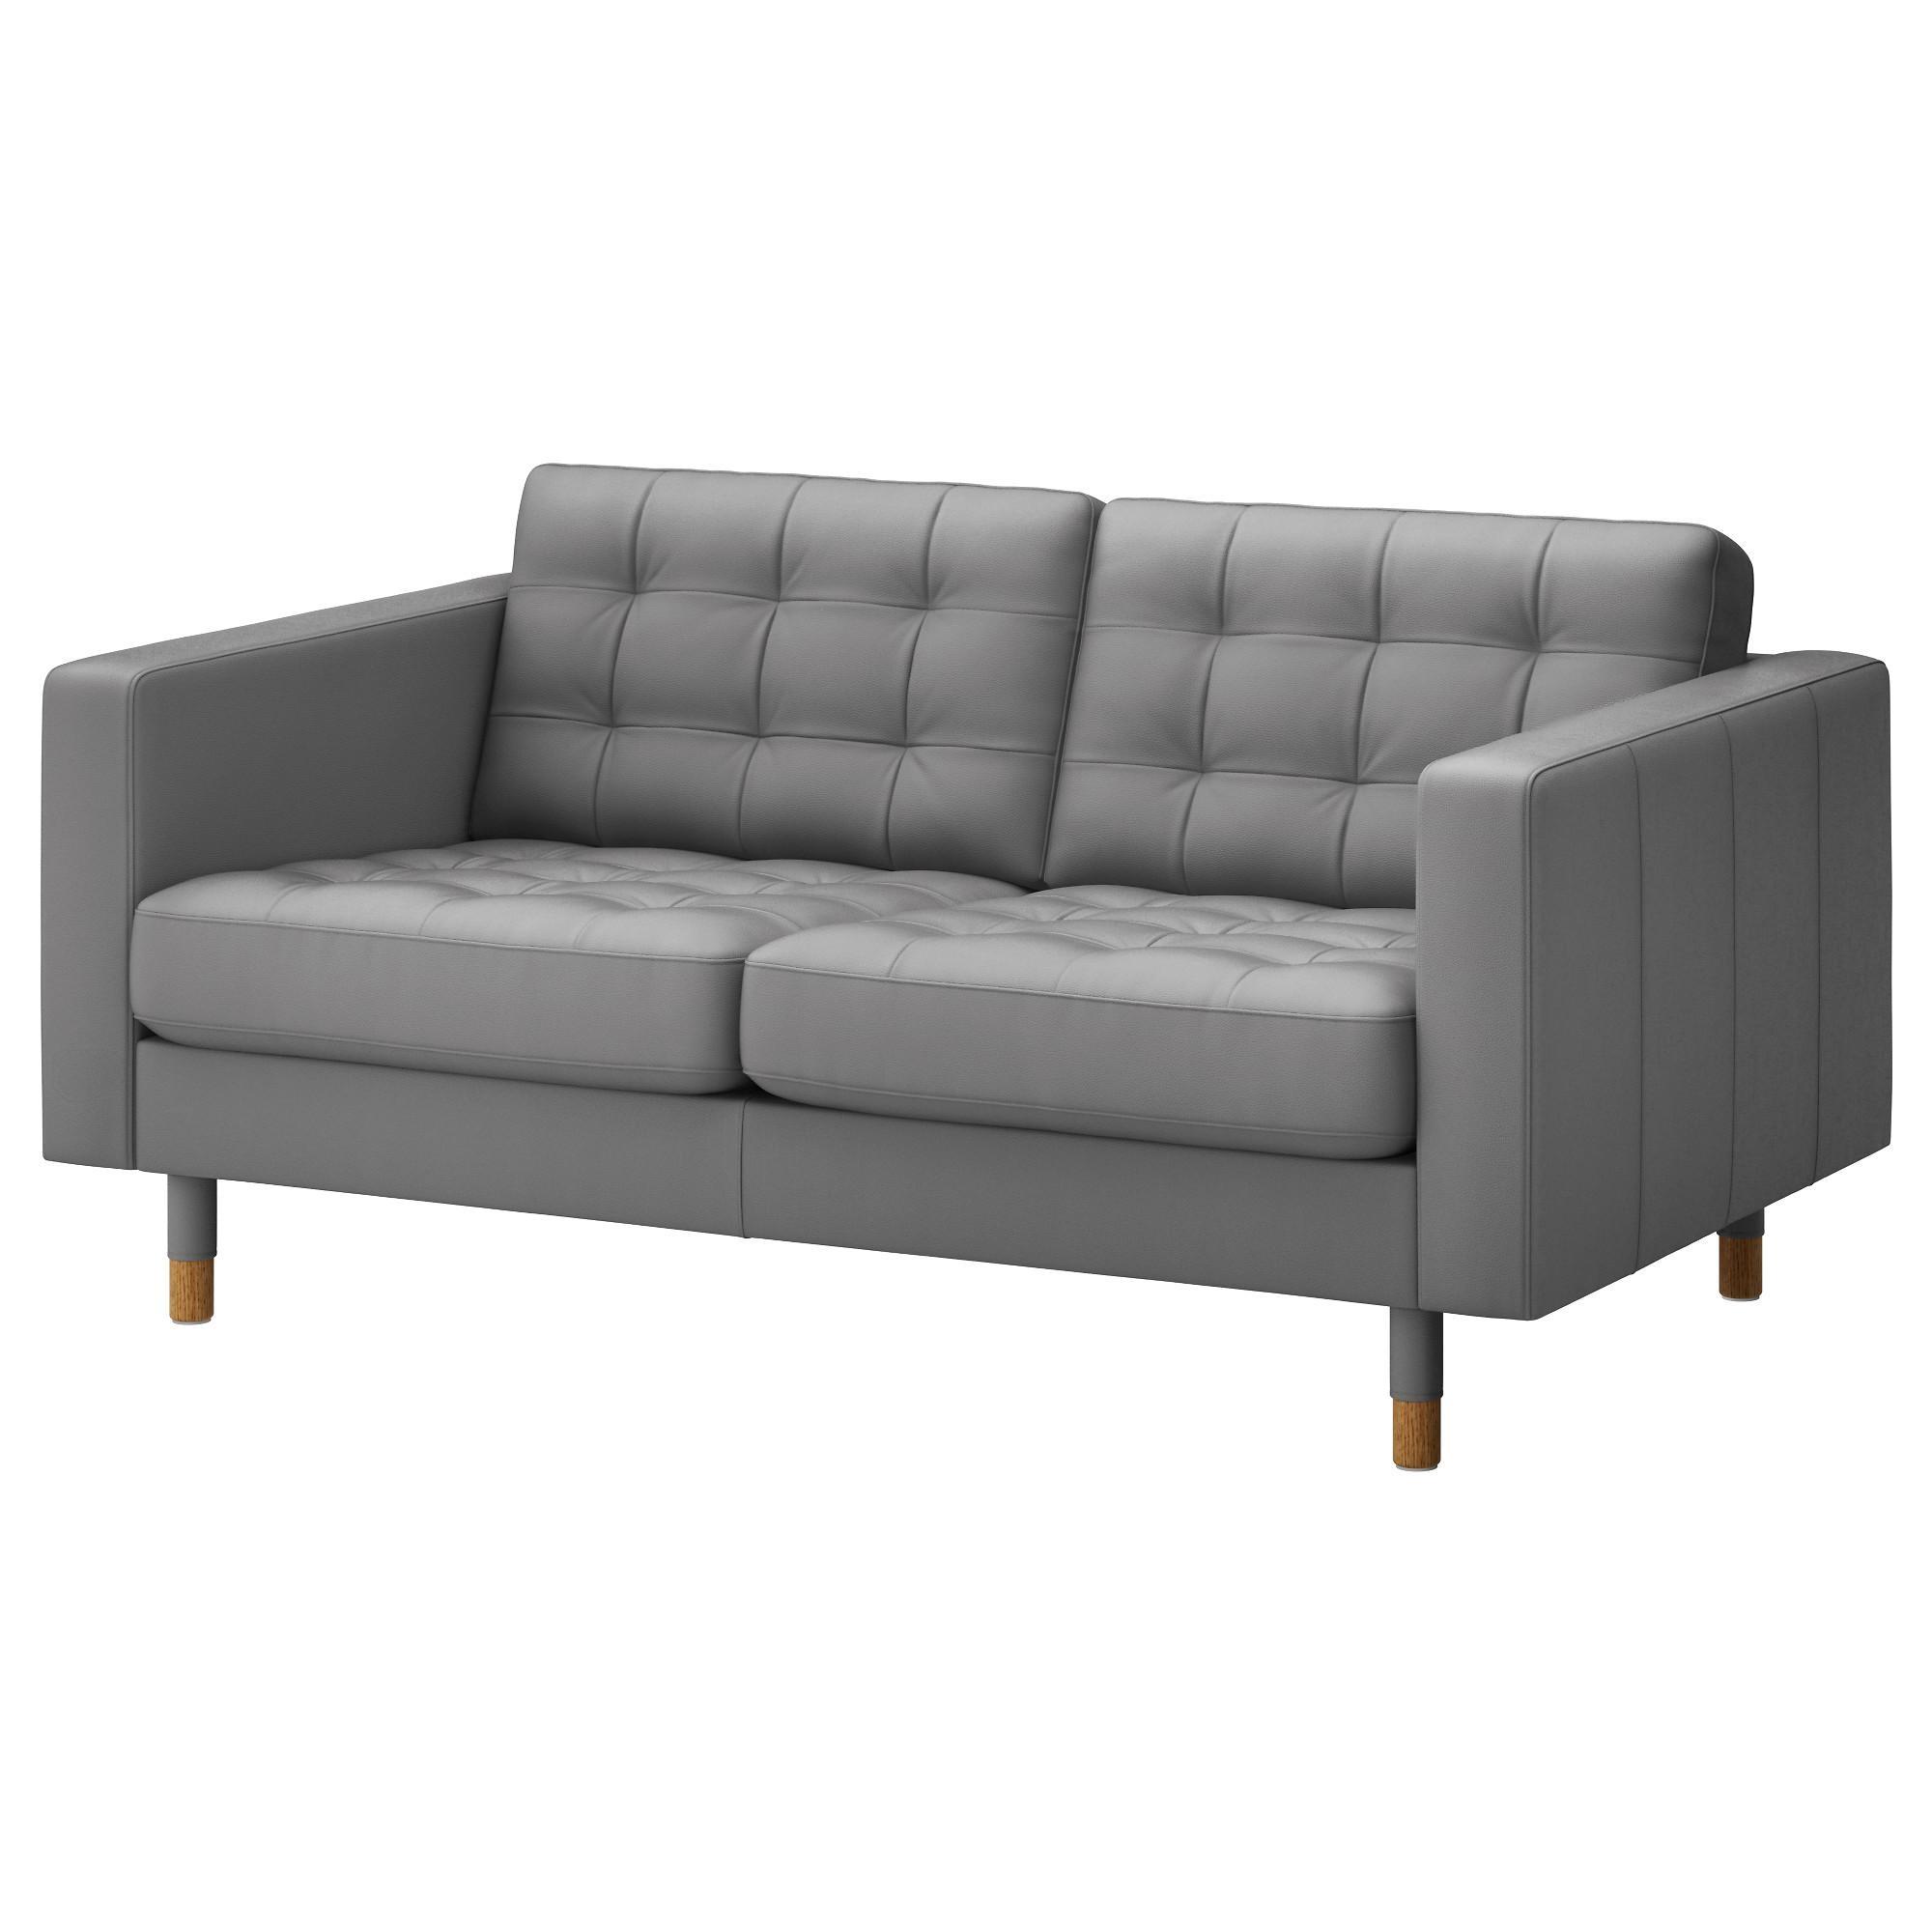 20 Best Ideas Small Sofas Ikea Sofa